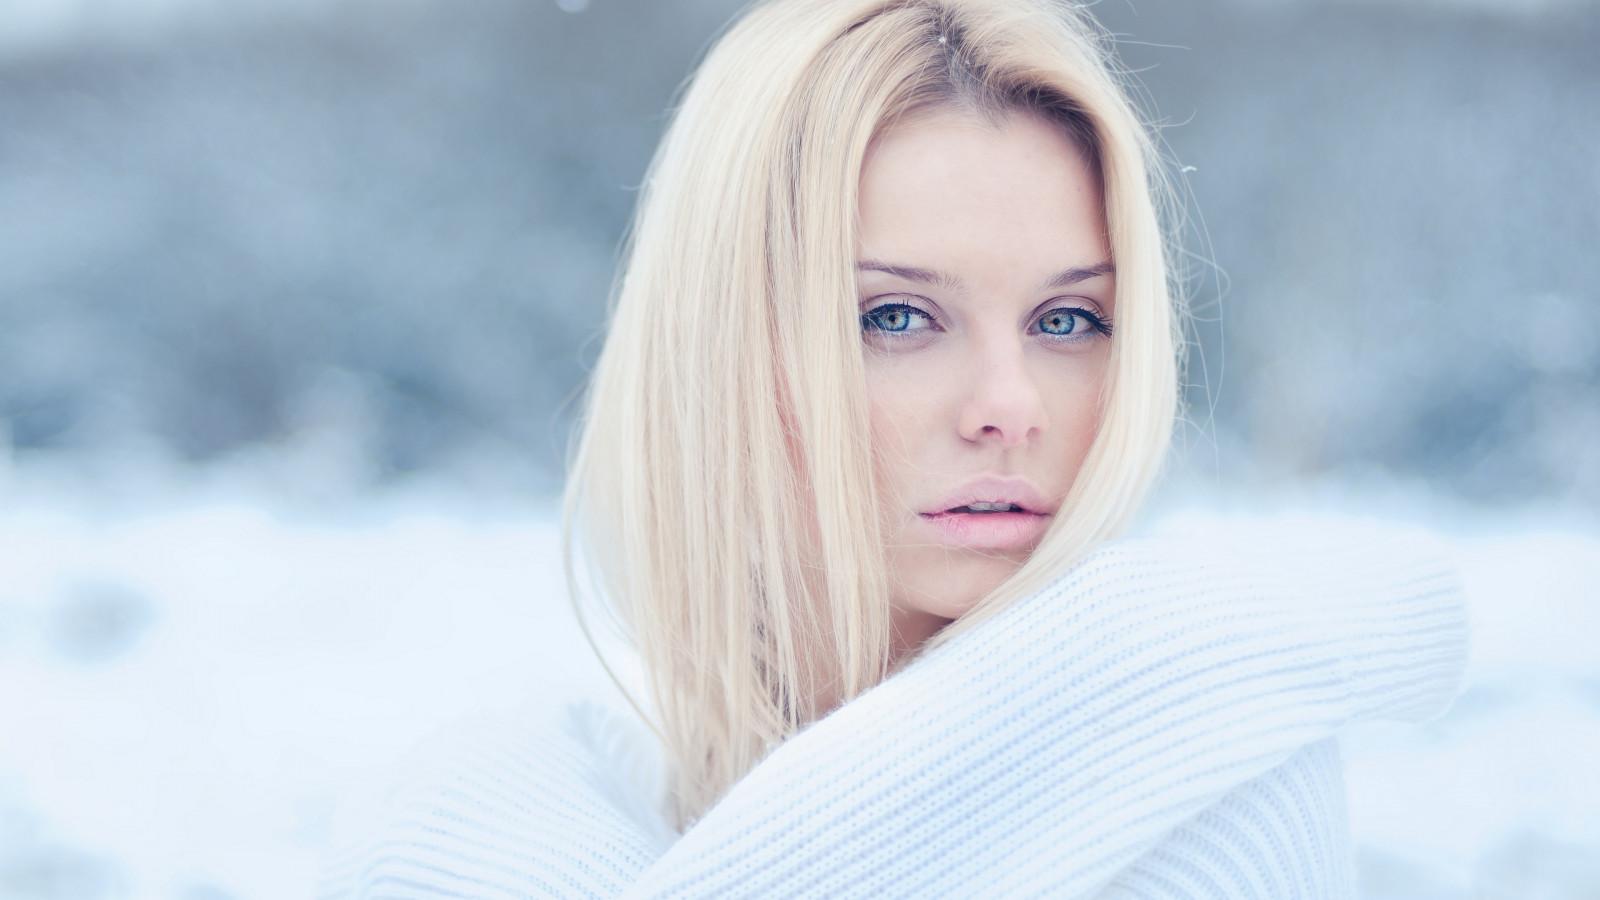 Wallpaper Face Model Blonde Long Hair Blue Eyes: Wallpaper : Face, Women, Model, Long Hair, Looking At